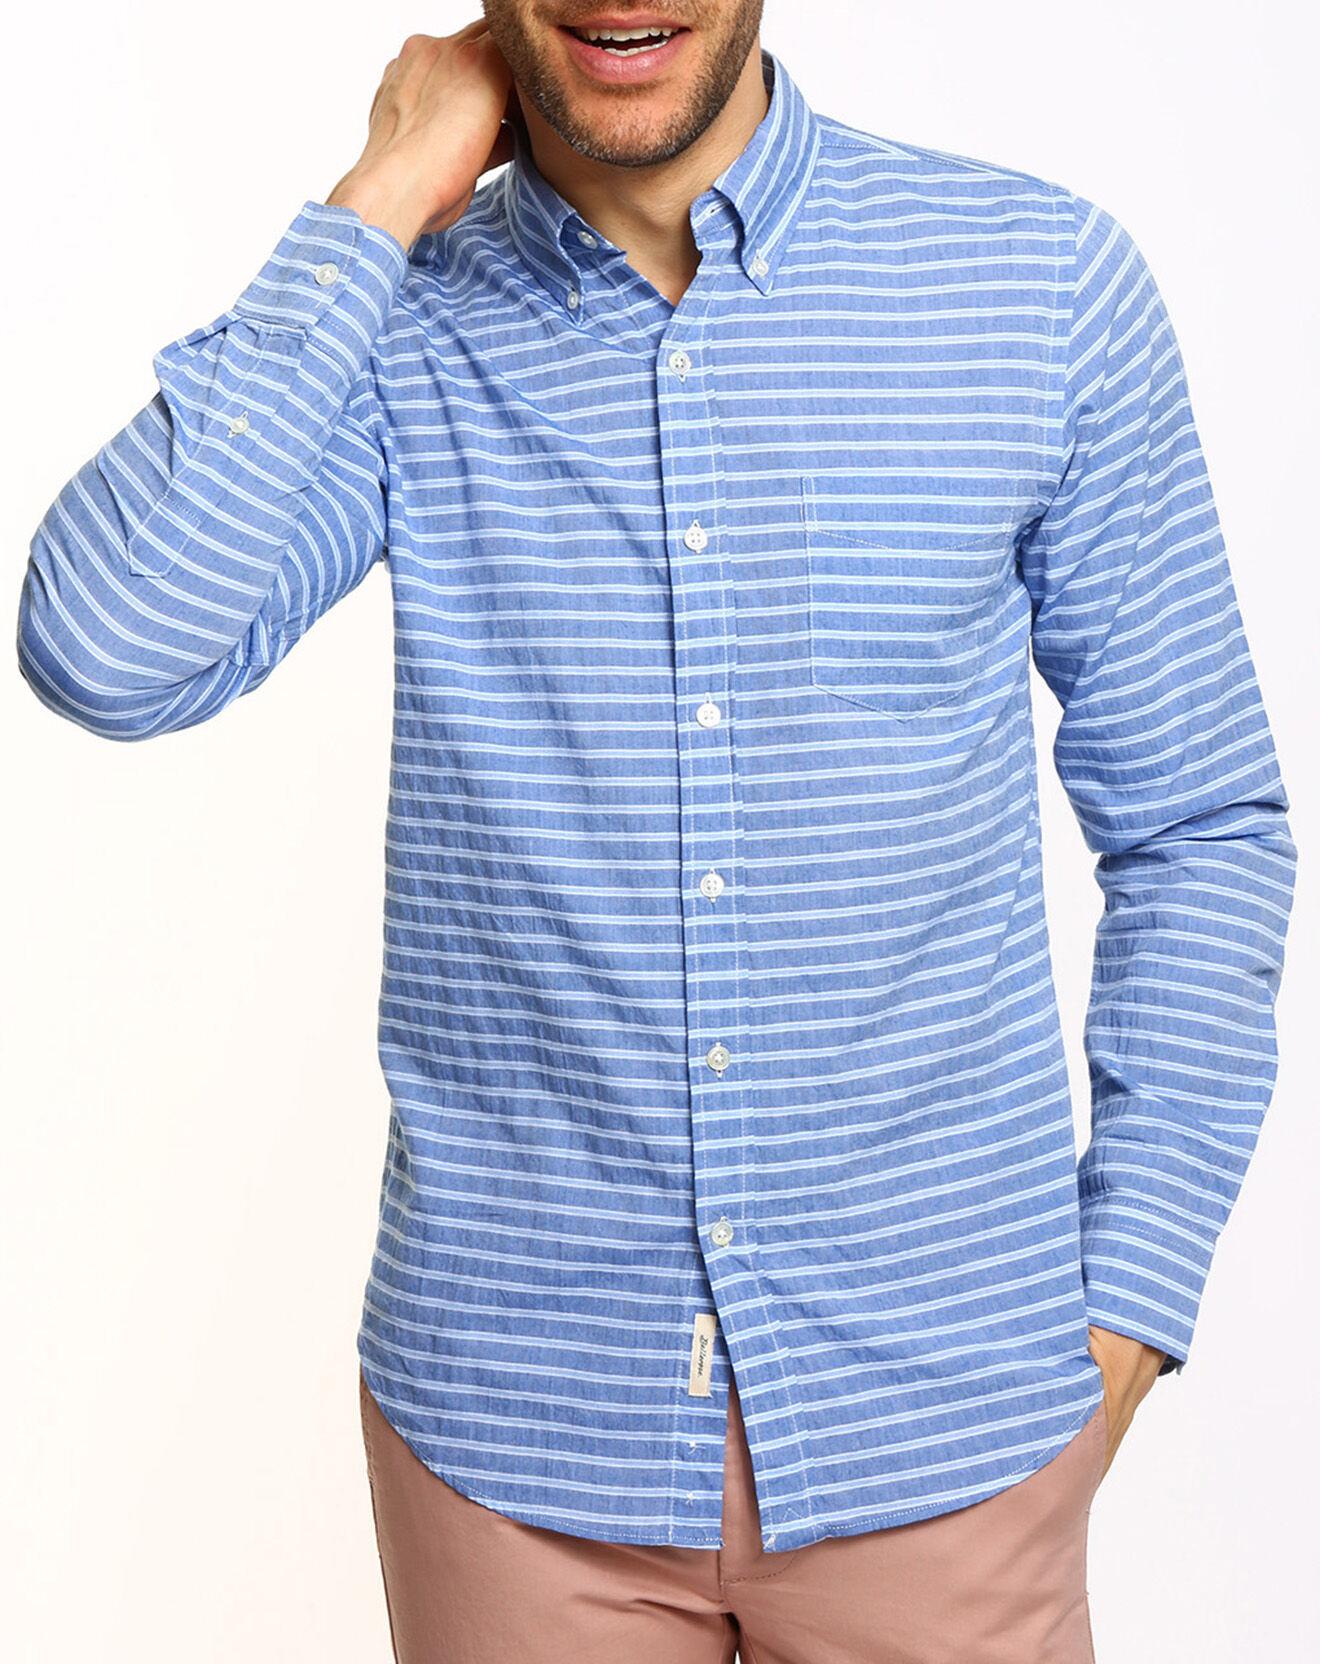 Chemise Mire rayée bleue